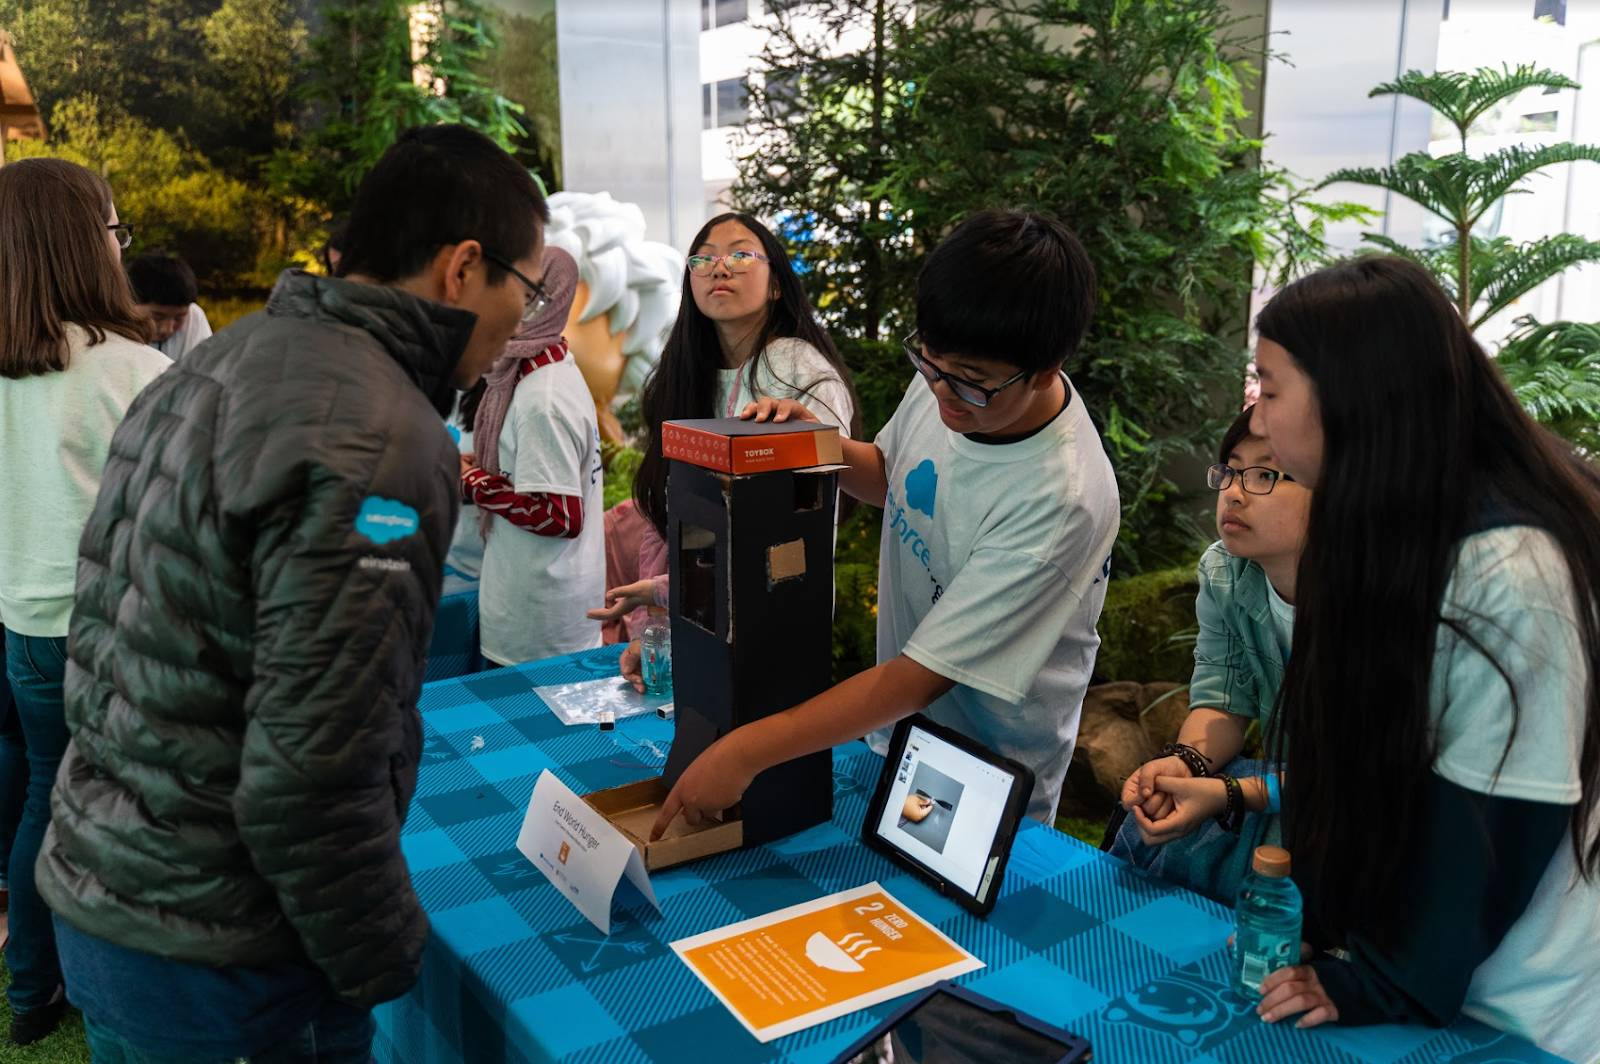 Salesforce によるサンフランシスコベイエリアのメイカーフェアでプロトタイプを紹介する生徒たち